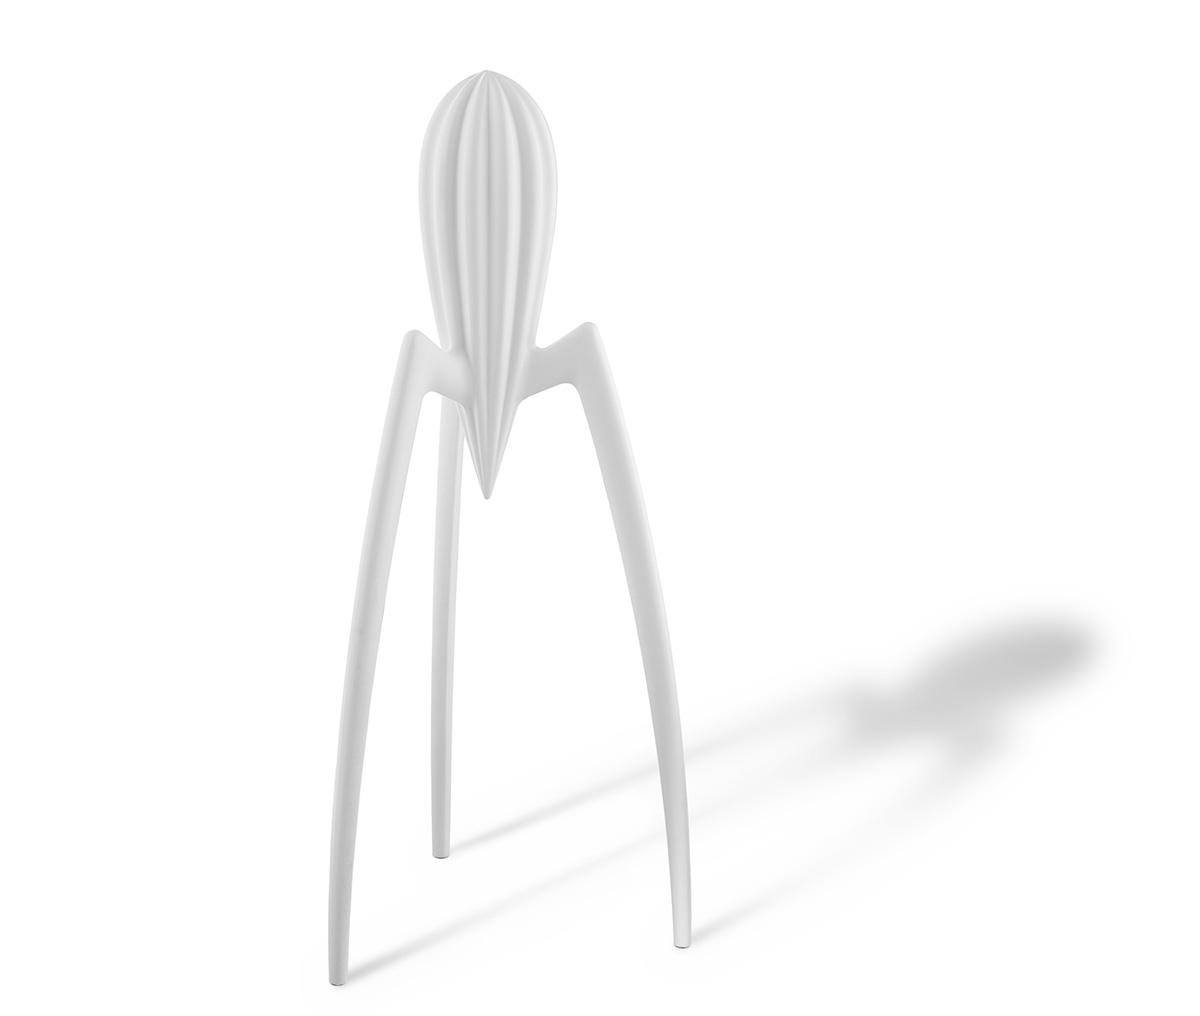 Juicy Salif, design Philippe Starck - Alessi - spremiagrumi